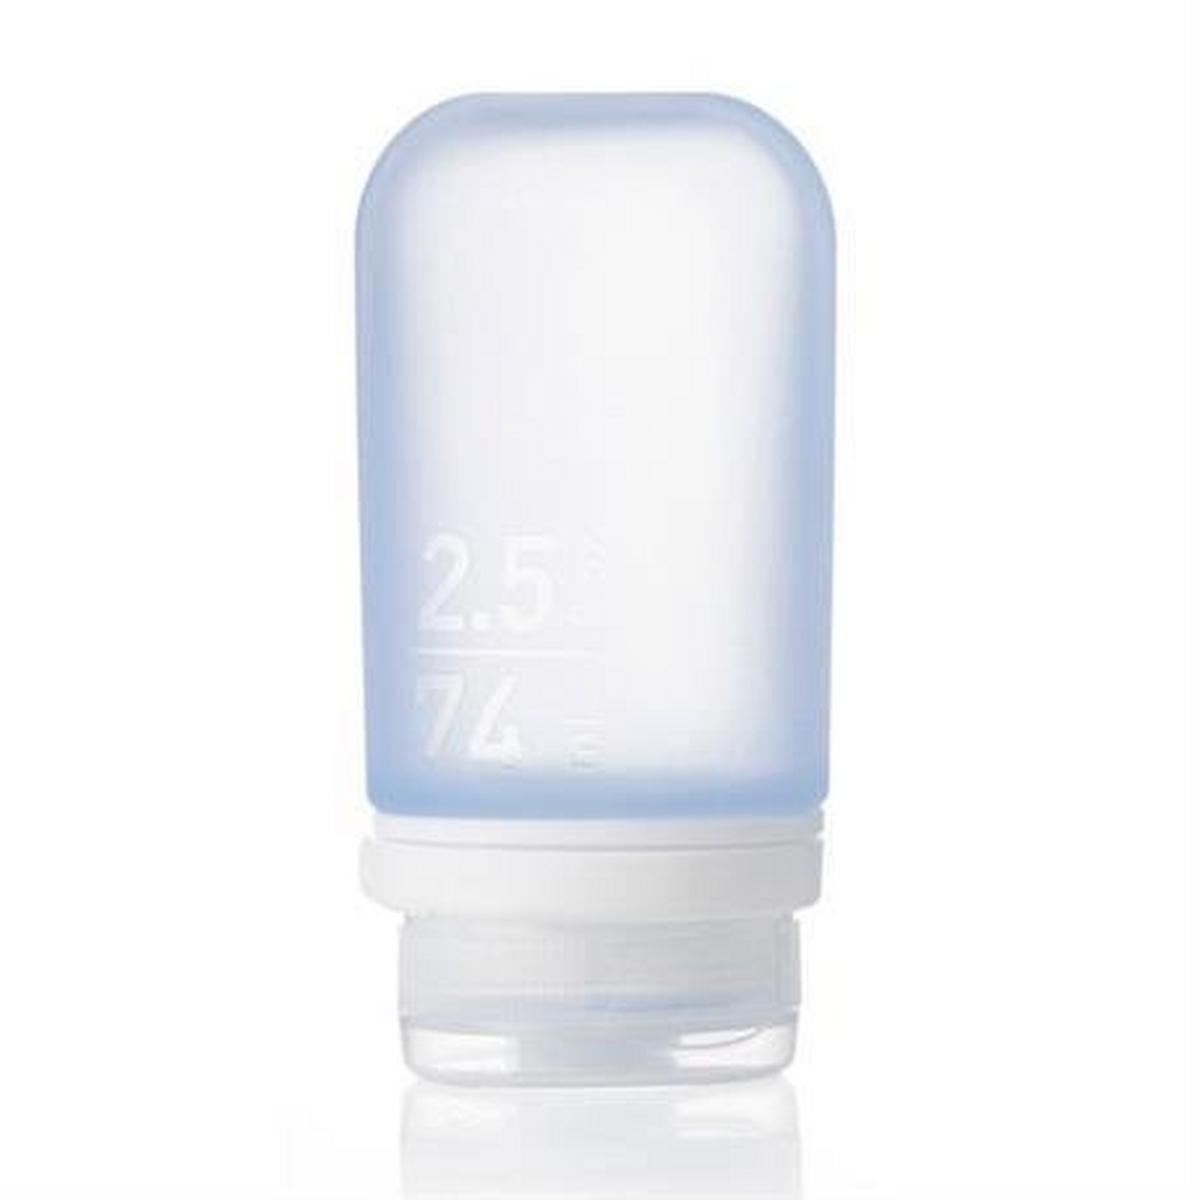 Humangear GoToob+ MEDIUM 74ml Clear/Purple/Turquoise (3 Pack)